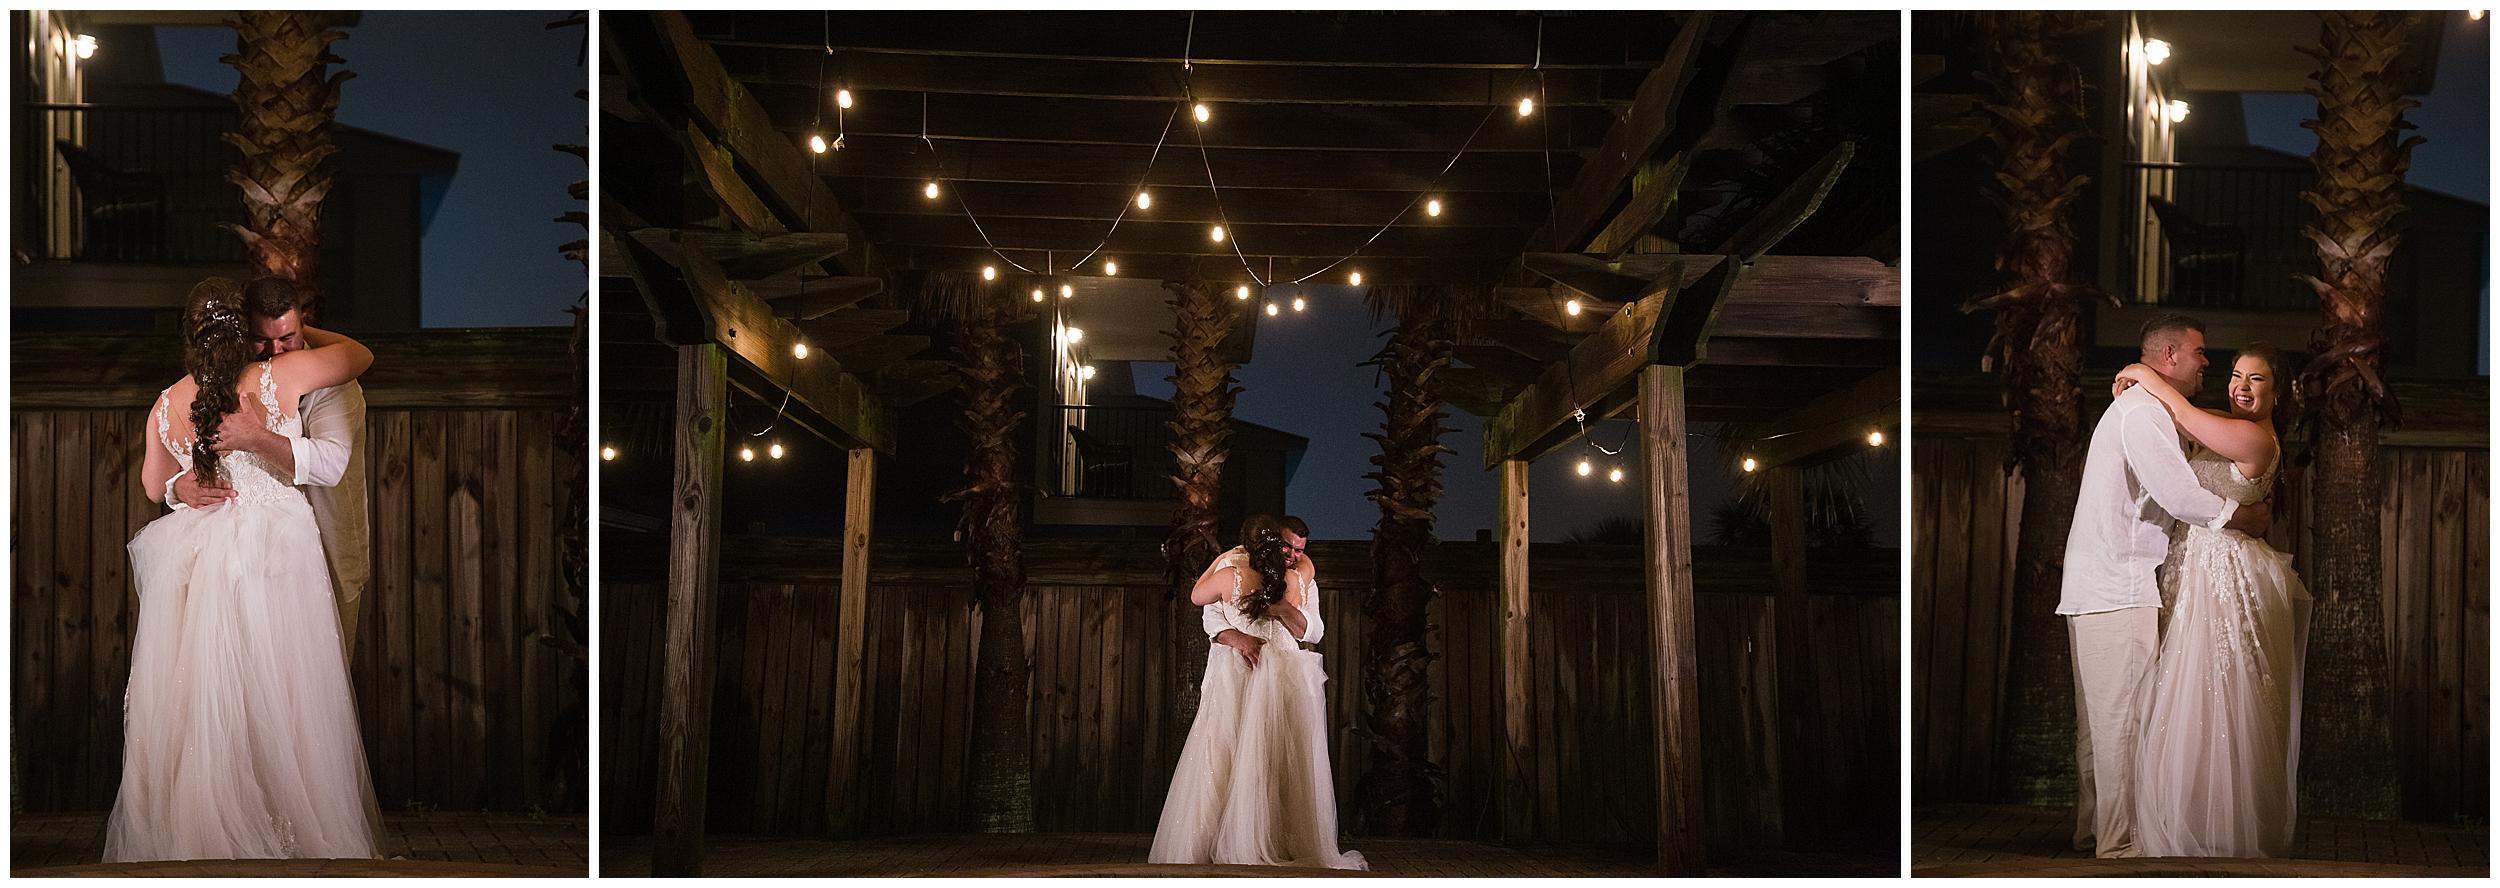 30a-Destin-Florida-Wedding-Photography-Jennie-Jeremy_0043.jpg